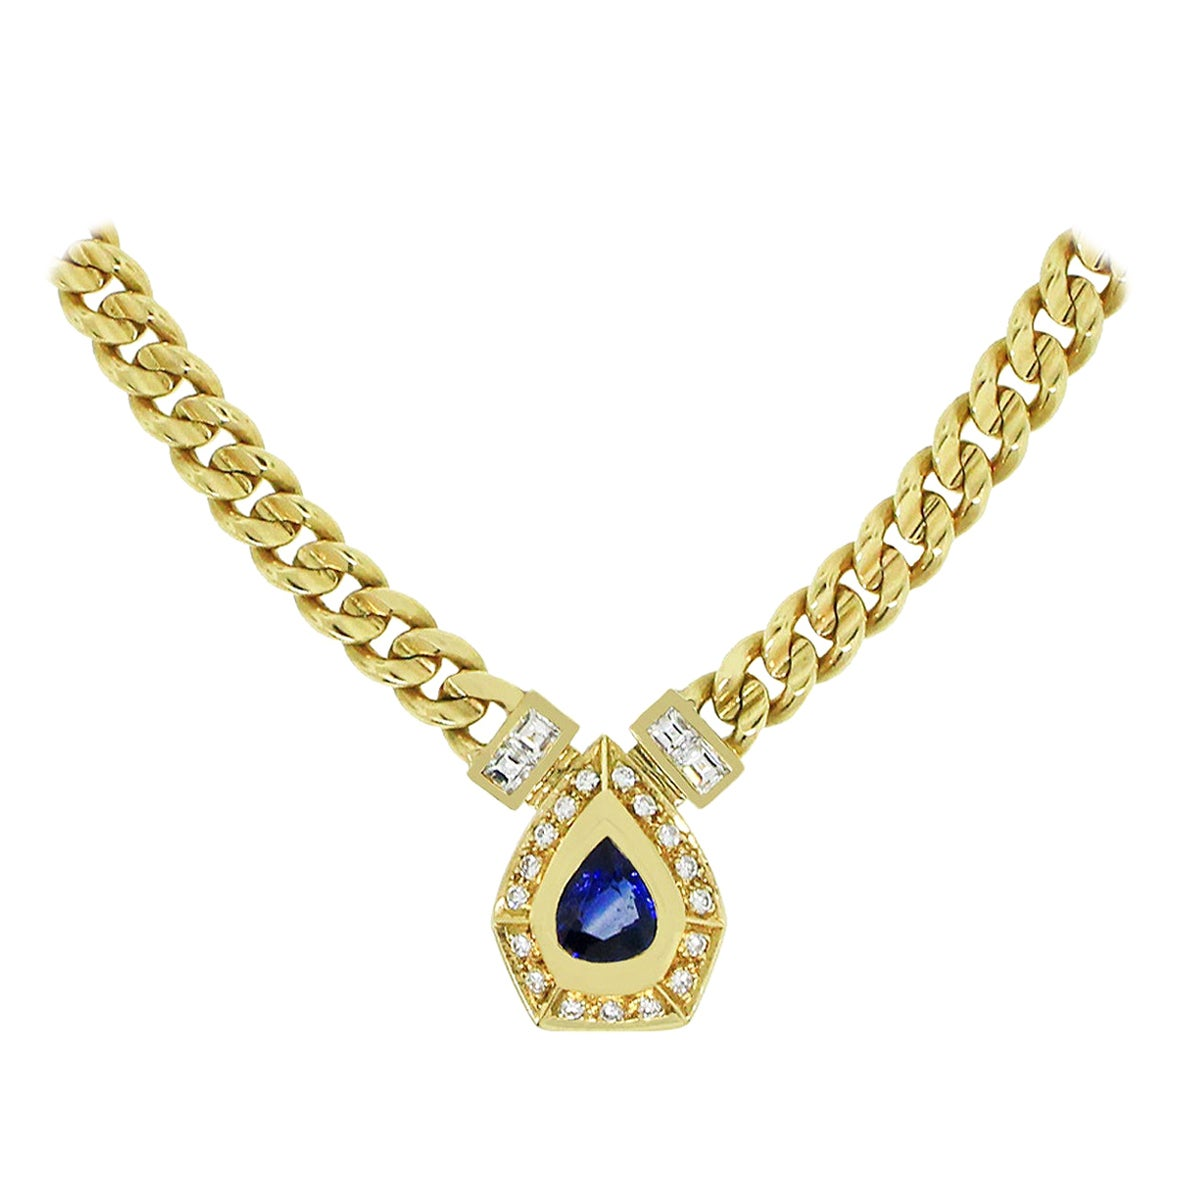 1 Carat Sapphire Necklace